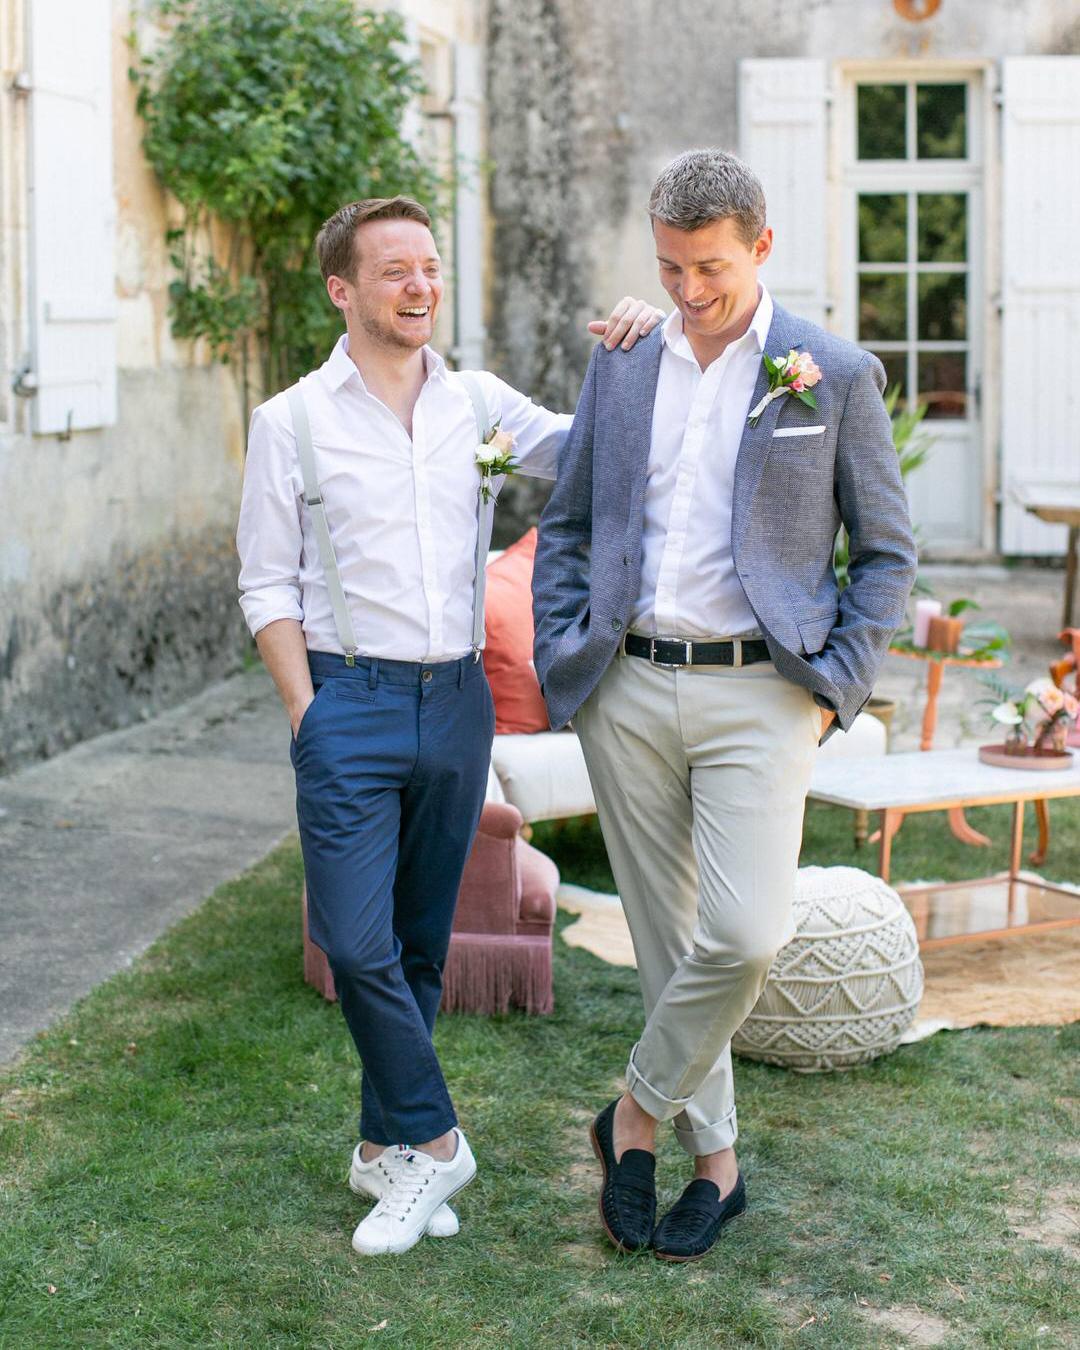 jen tim wedding casual groomsmen